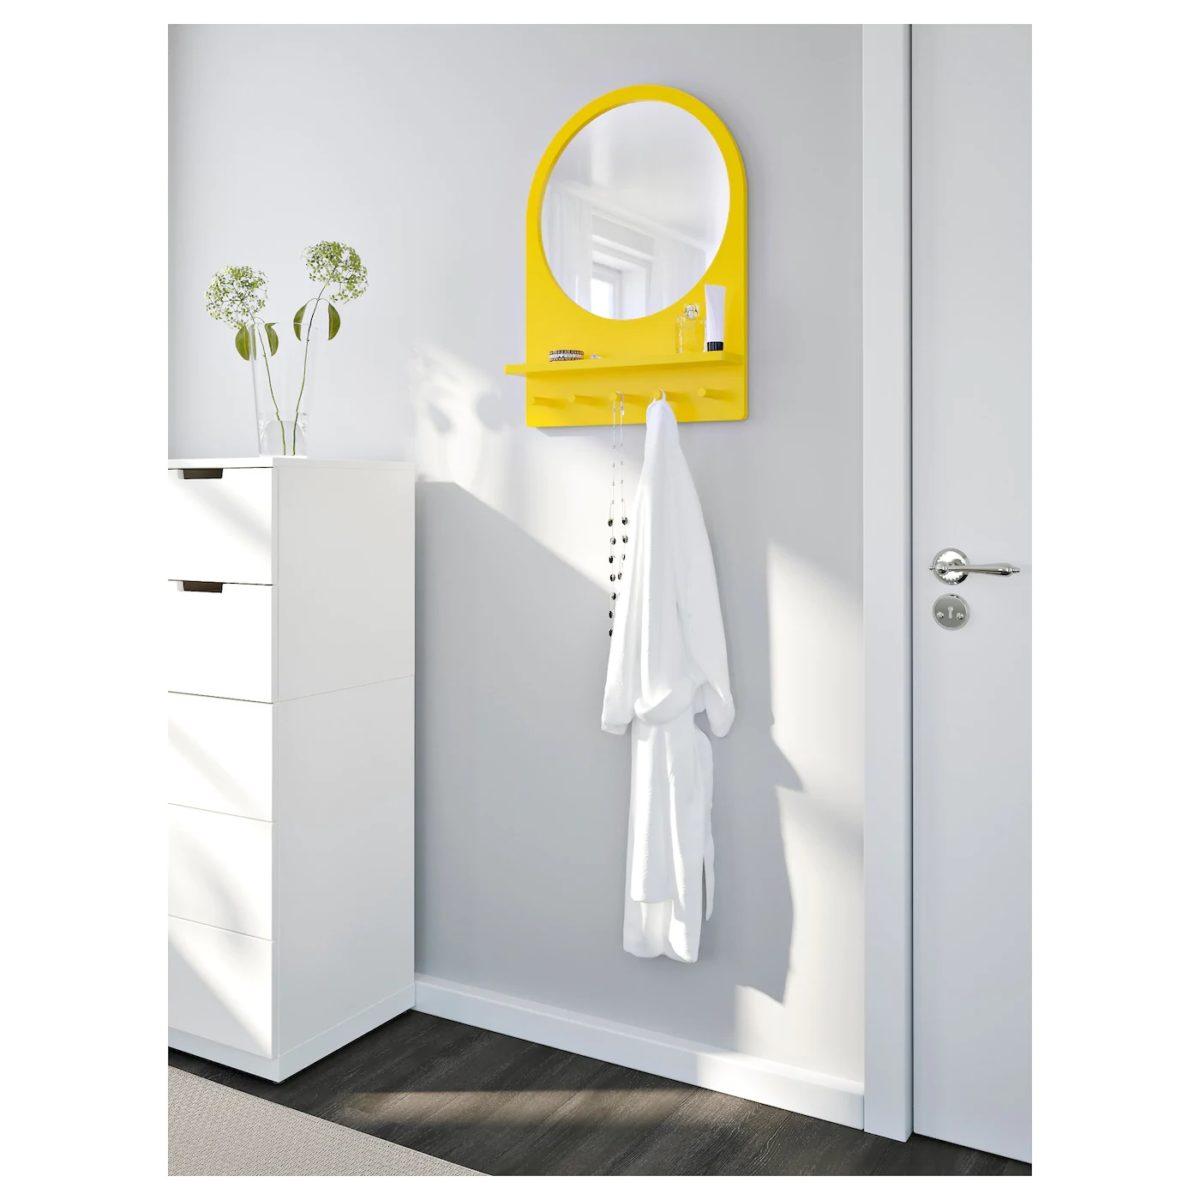 specchio-ikea-giallo-saltrod